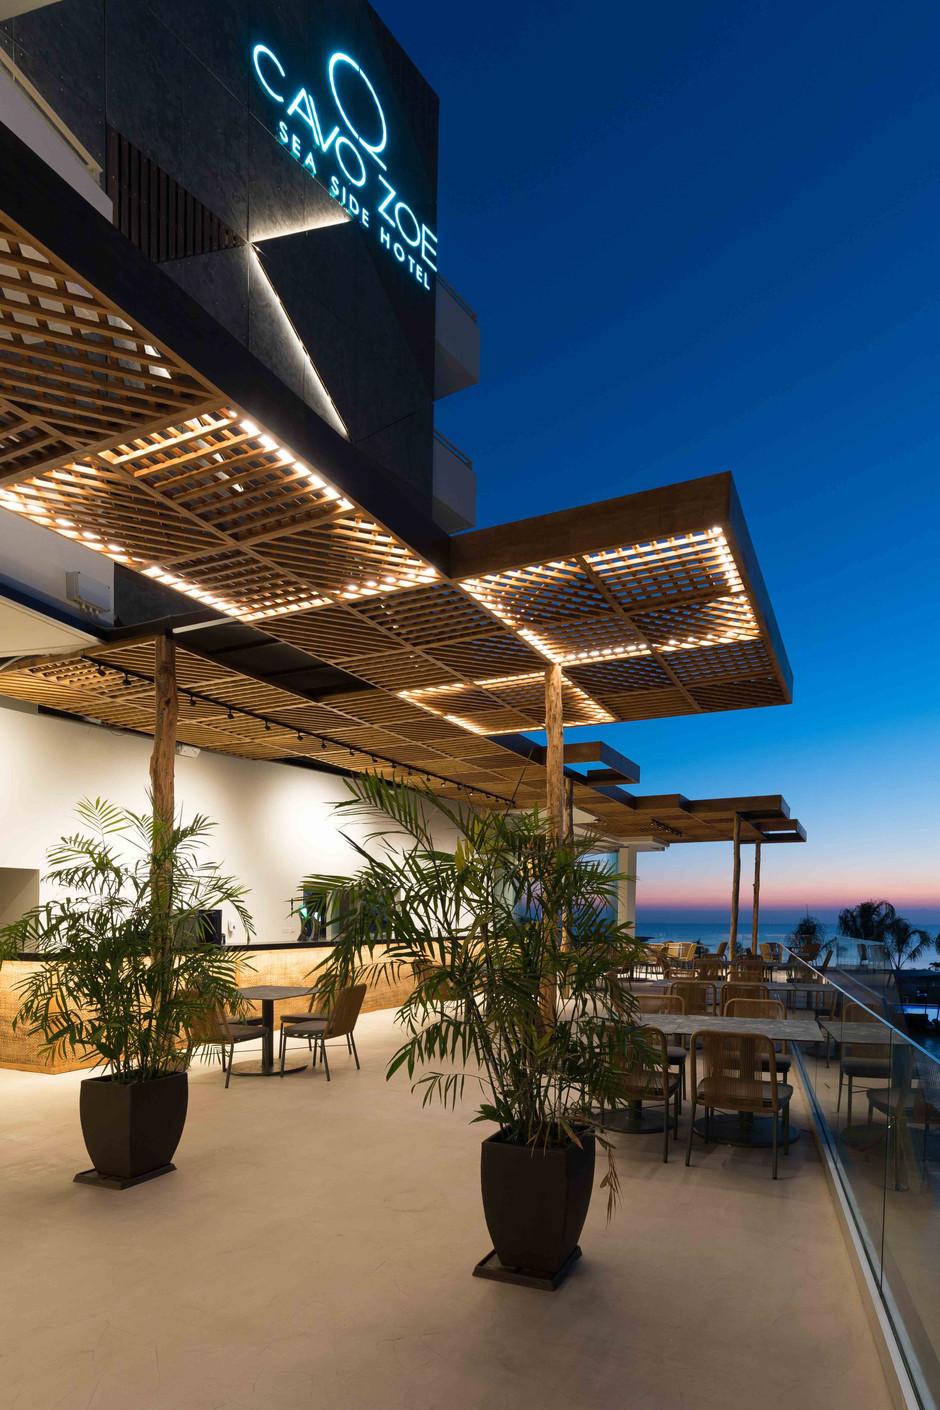 Cavo Zoe Seaside Hotel-24.jpg